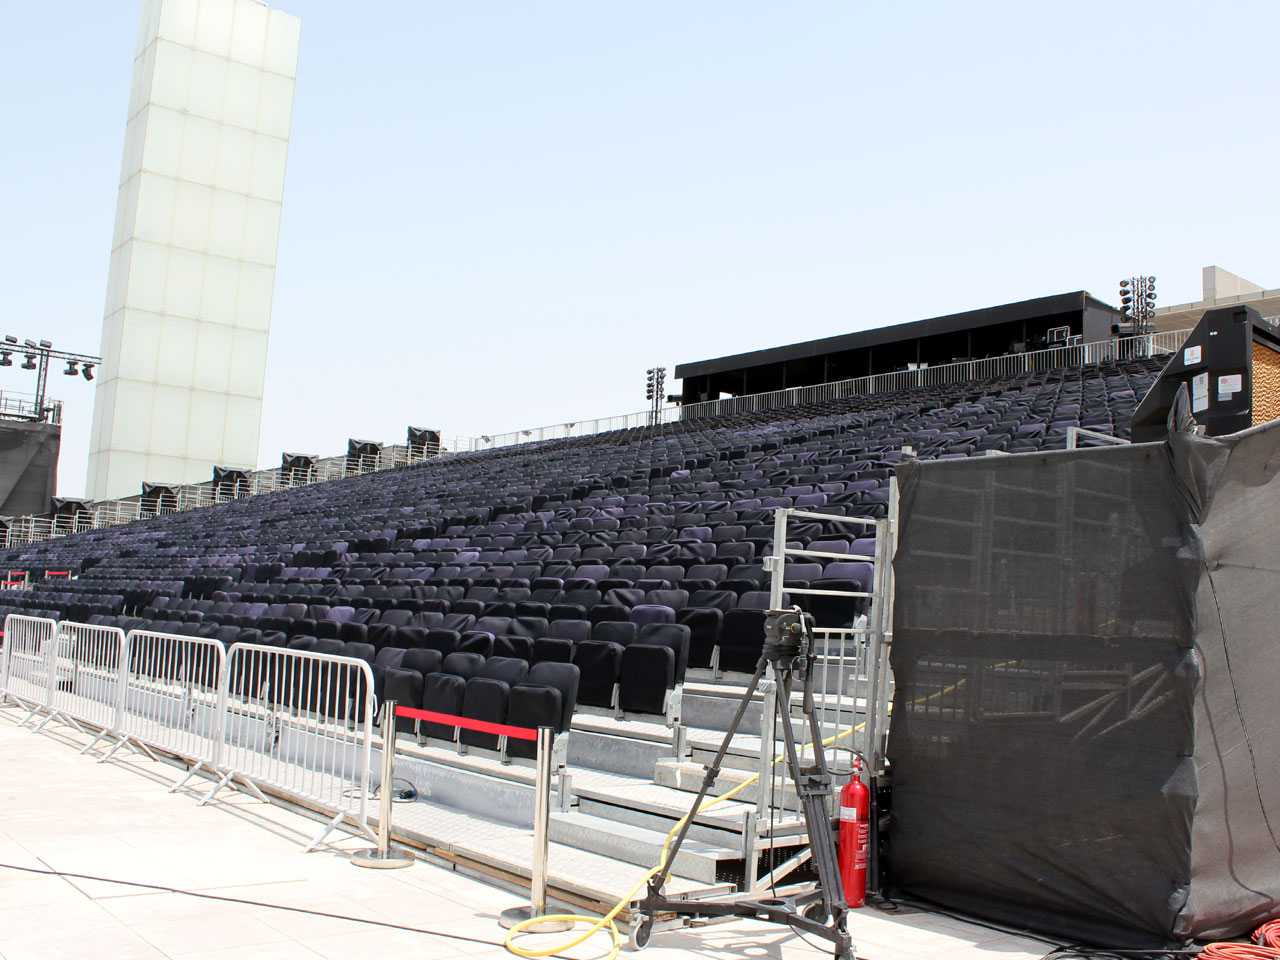 qatar-foundation-convocation-grandstands-2019-1